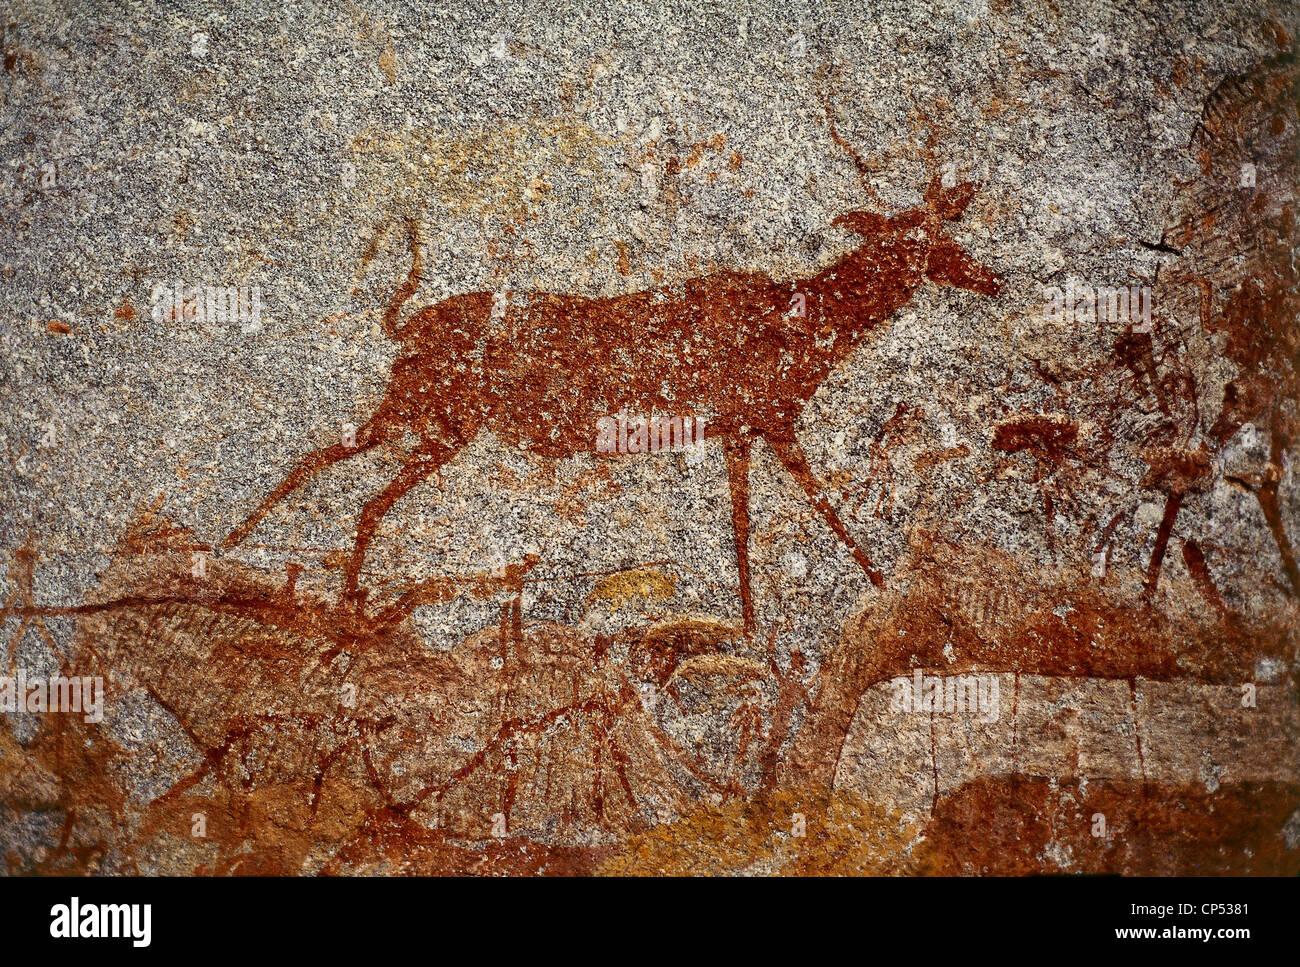 ZIMBABWE Matobo Nat.Park NSWATUGI VERNICE grotta di roccia Foto Stock